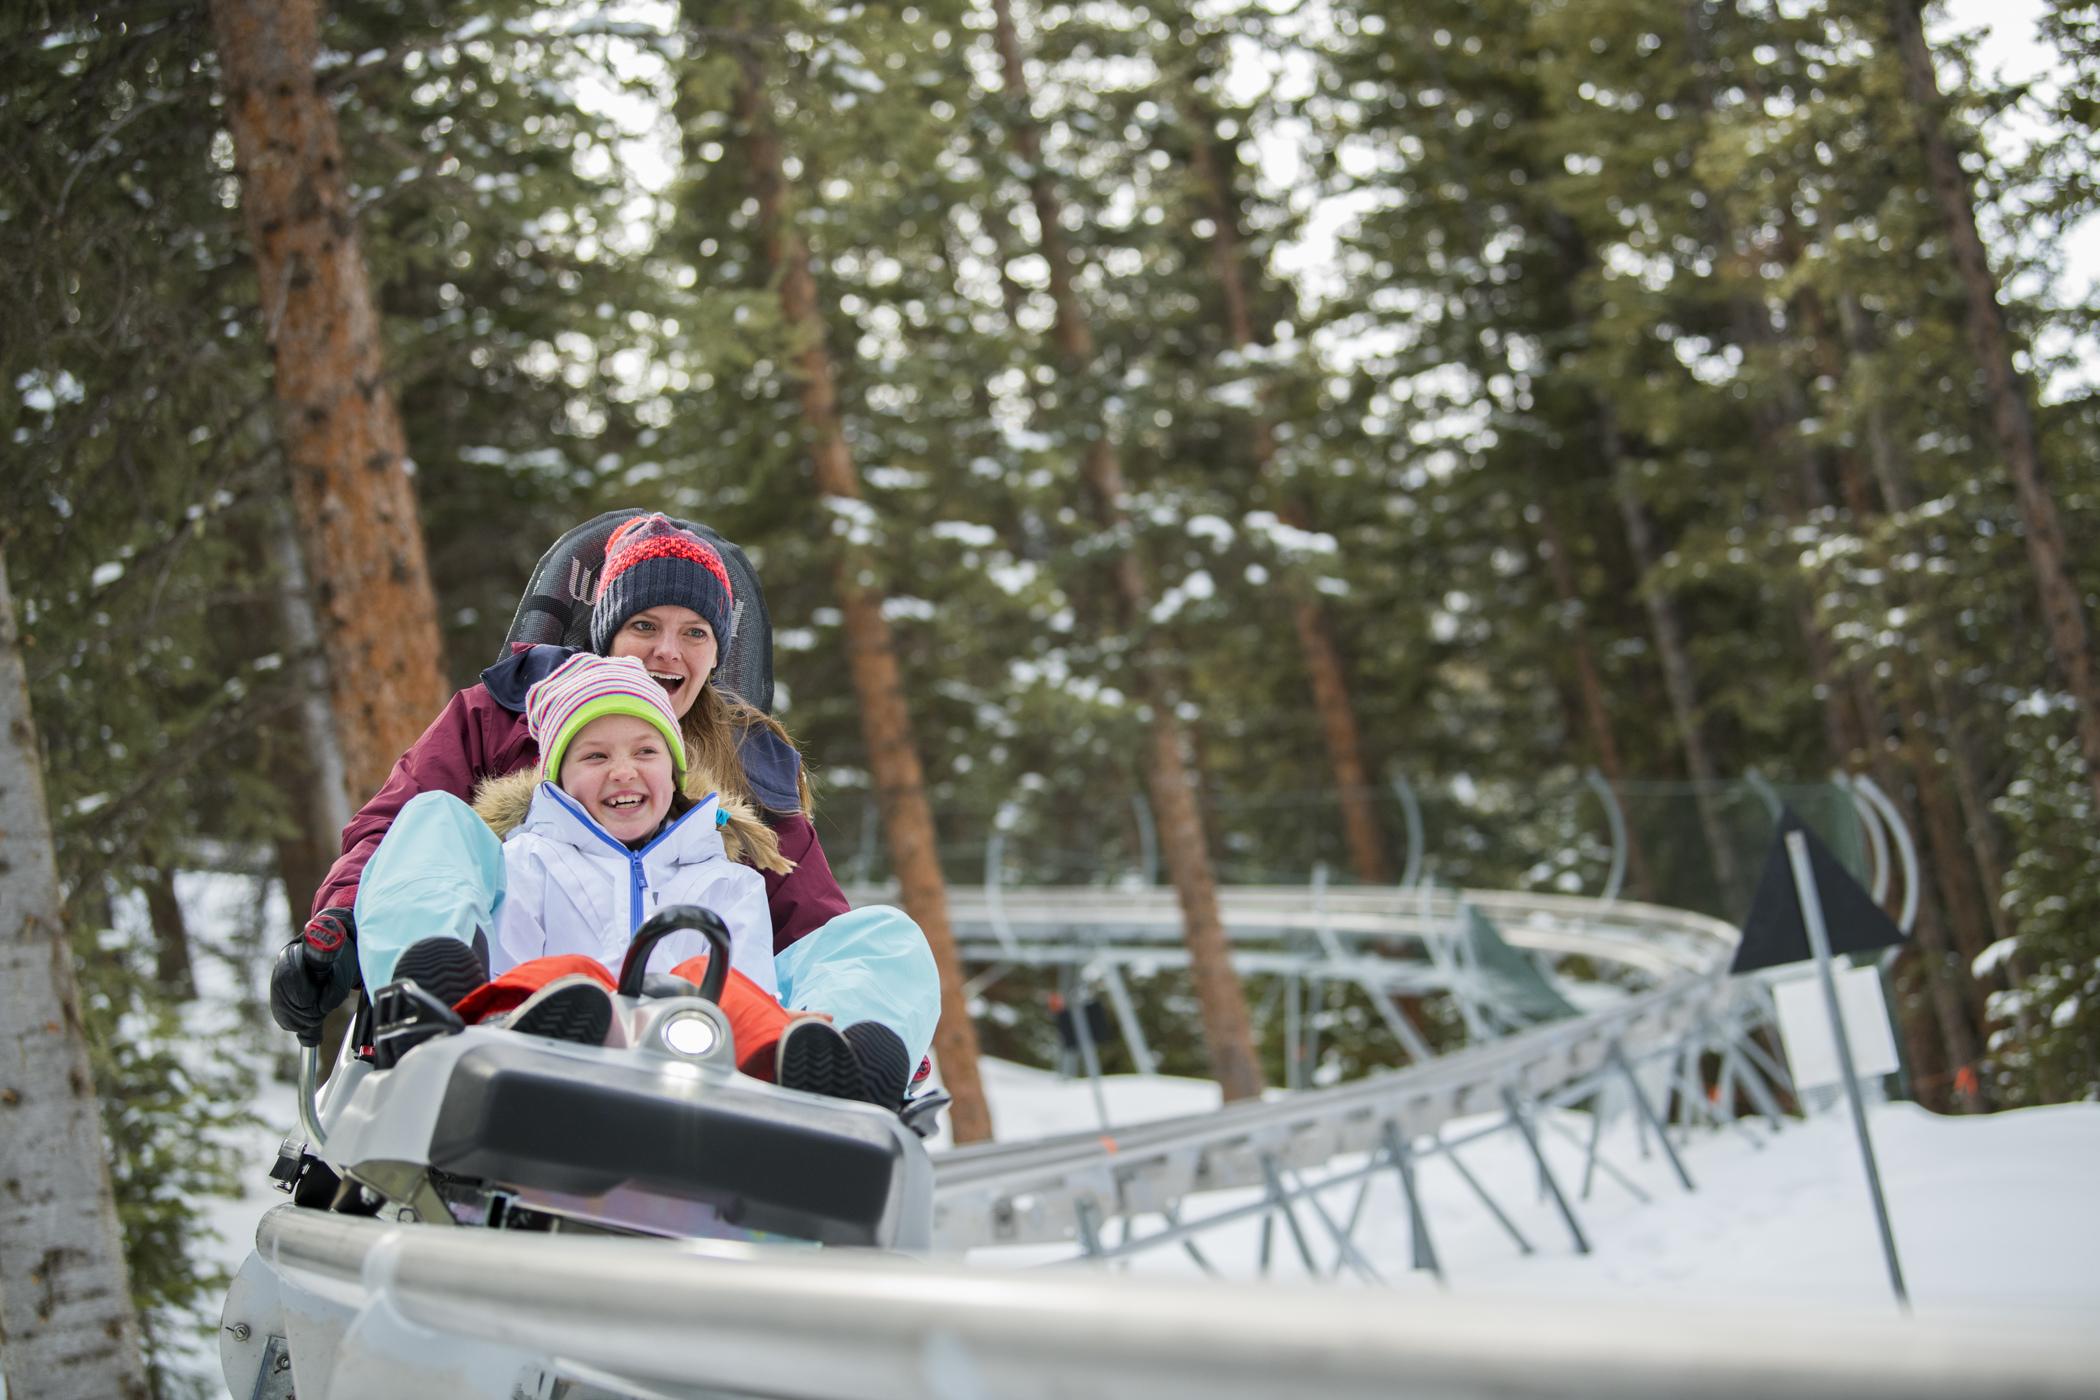 Aspen Snowmass Activities SkiBookings.com